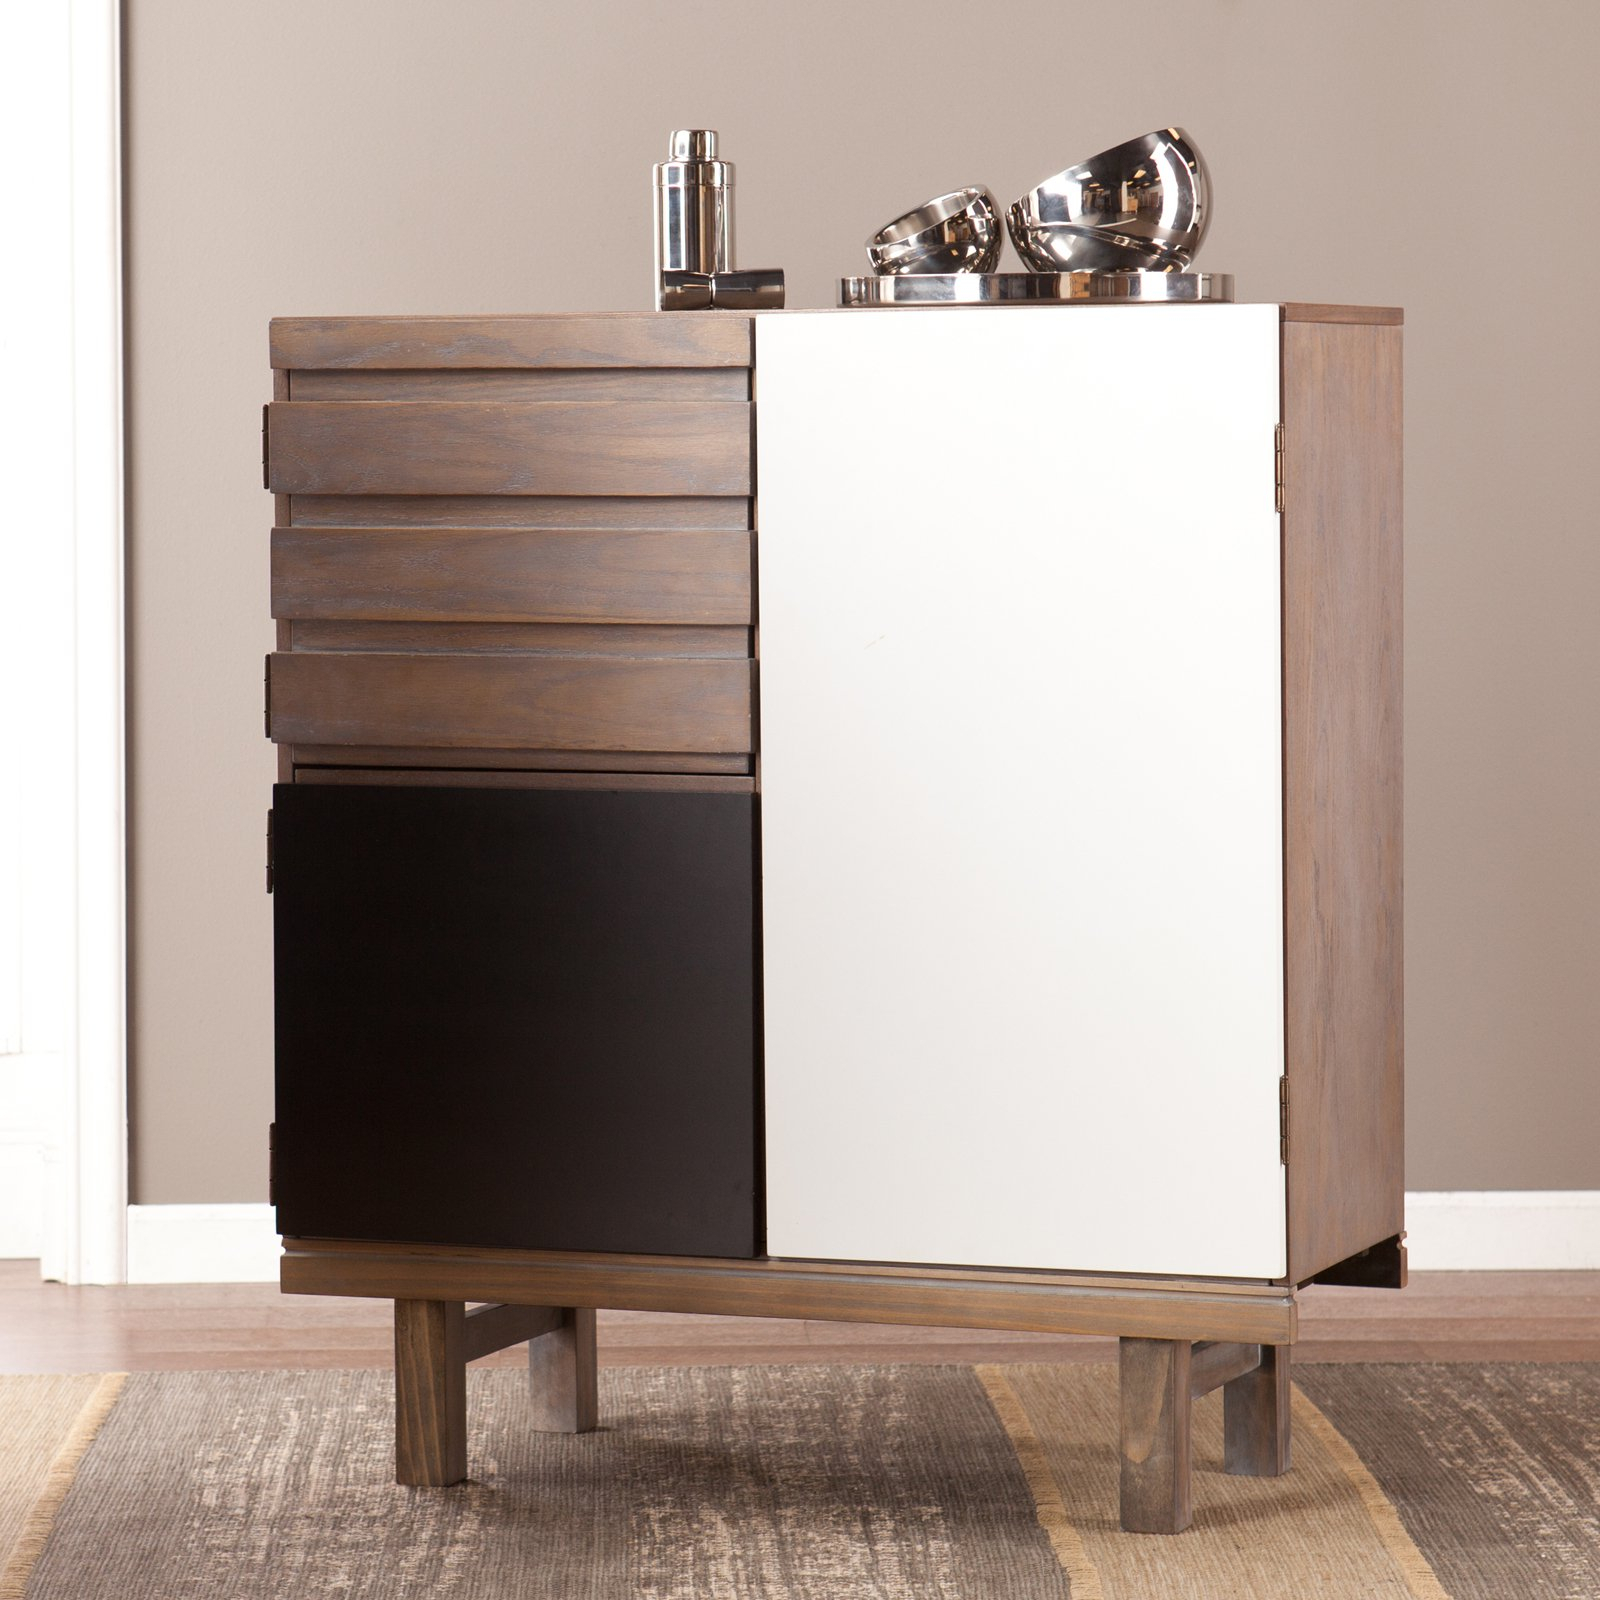 Holly & Martin Chaz Cabinet, Mid Century Modern, Burnt Oak – Walmart Throughout Burnt Oak Metal Sideboards (View 24 of 30)